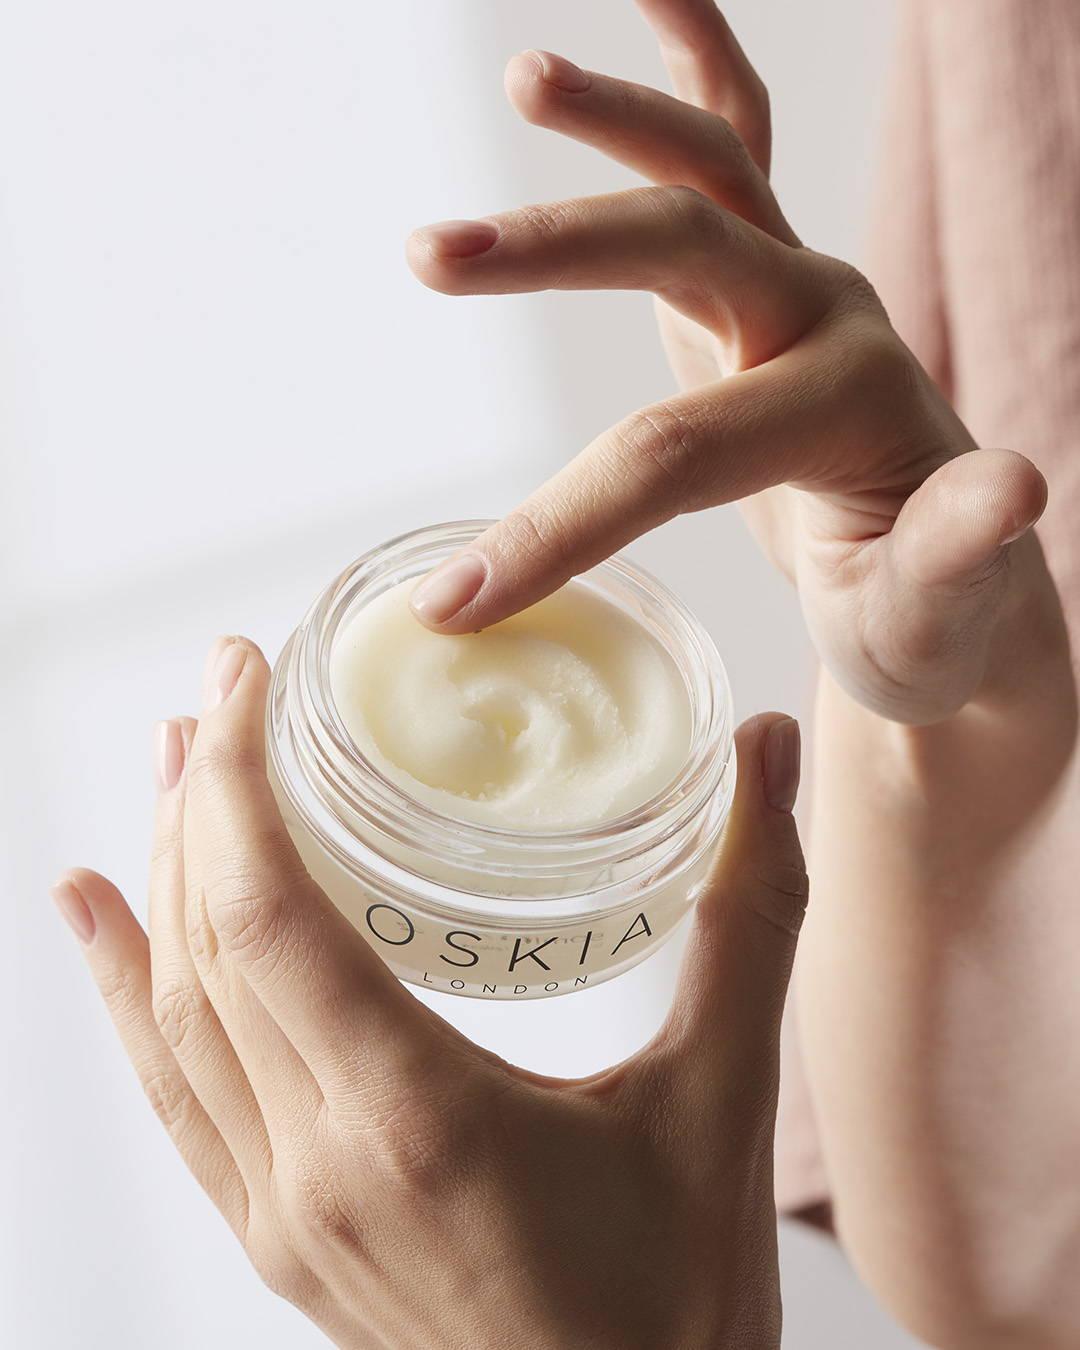 Lancement Oskia: Micro Exfoliating Balm Oskia, texture épaisse et particules ultra-fines